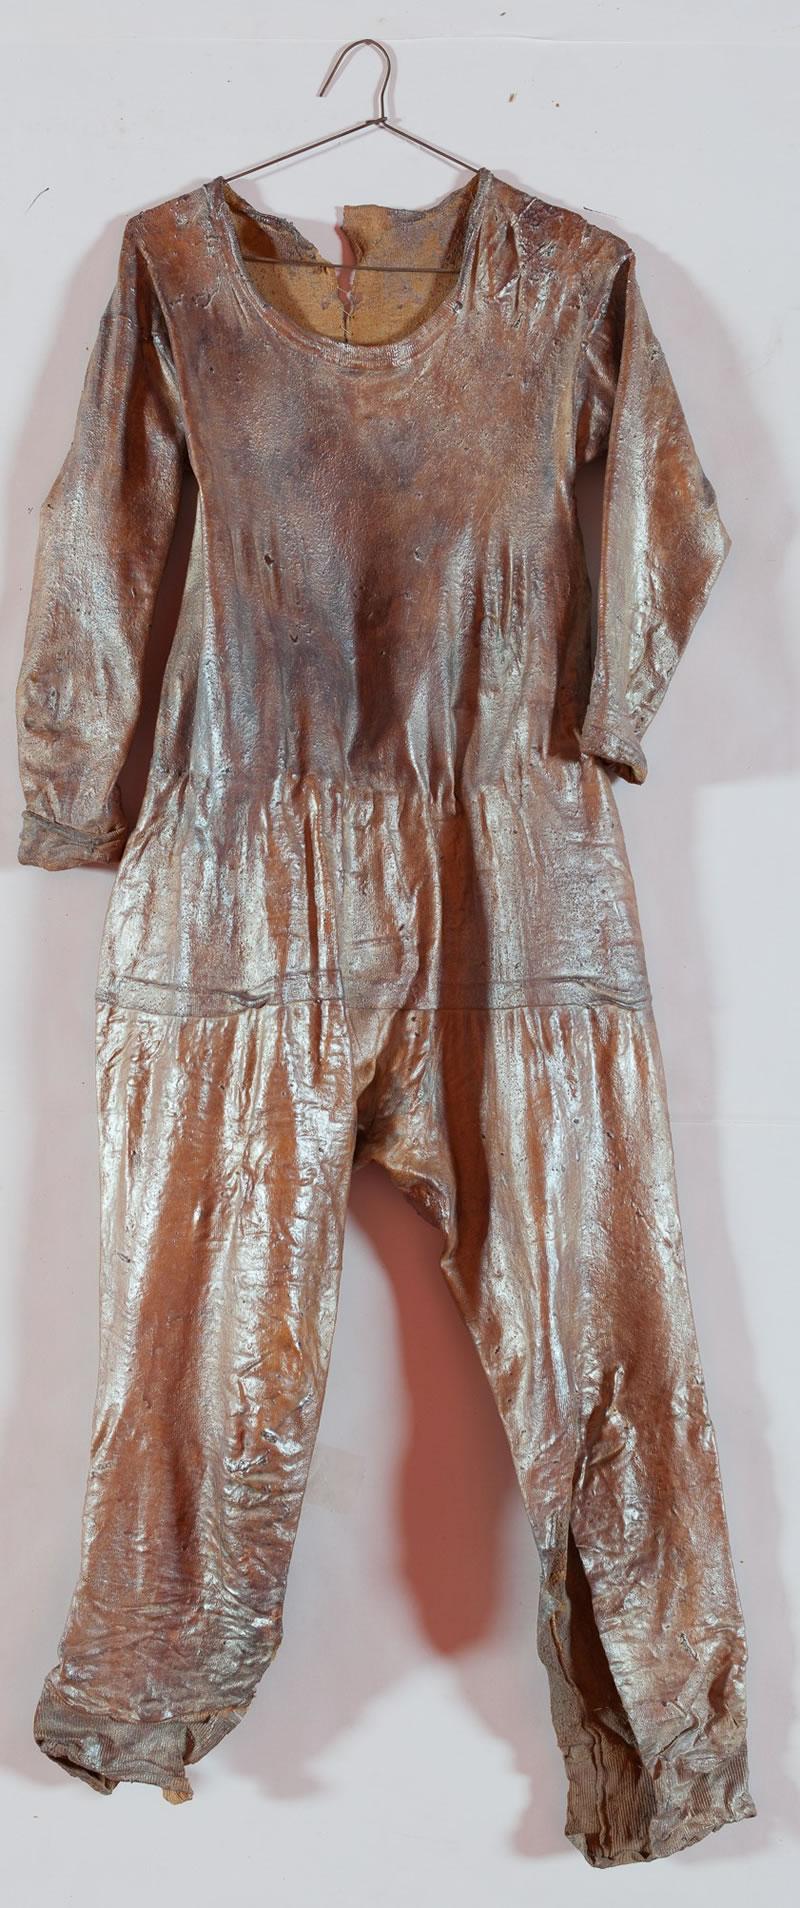 1983 Der Schlupfakt der Parkettlibelle in Le Landeron 1 of 6 pieces, Textile, latex and mother of pearl pigment 130 x 105 cm